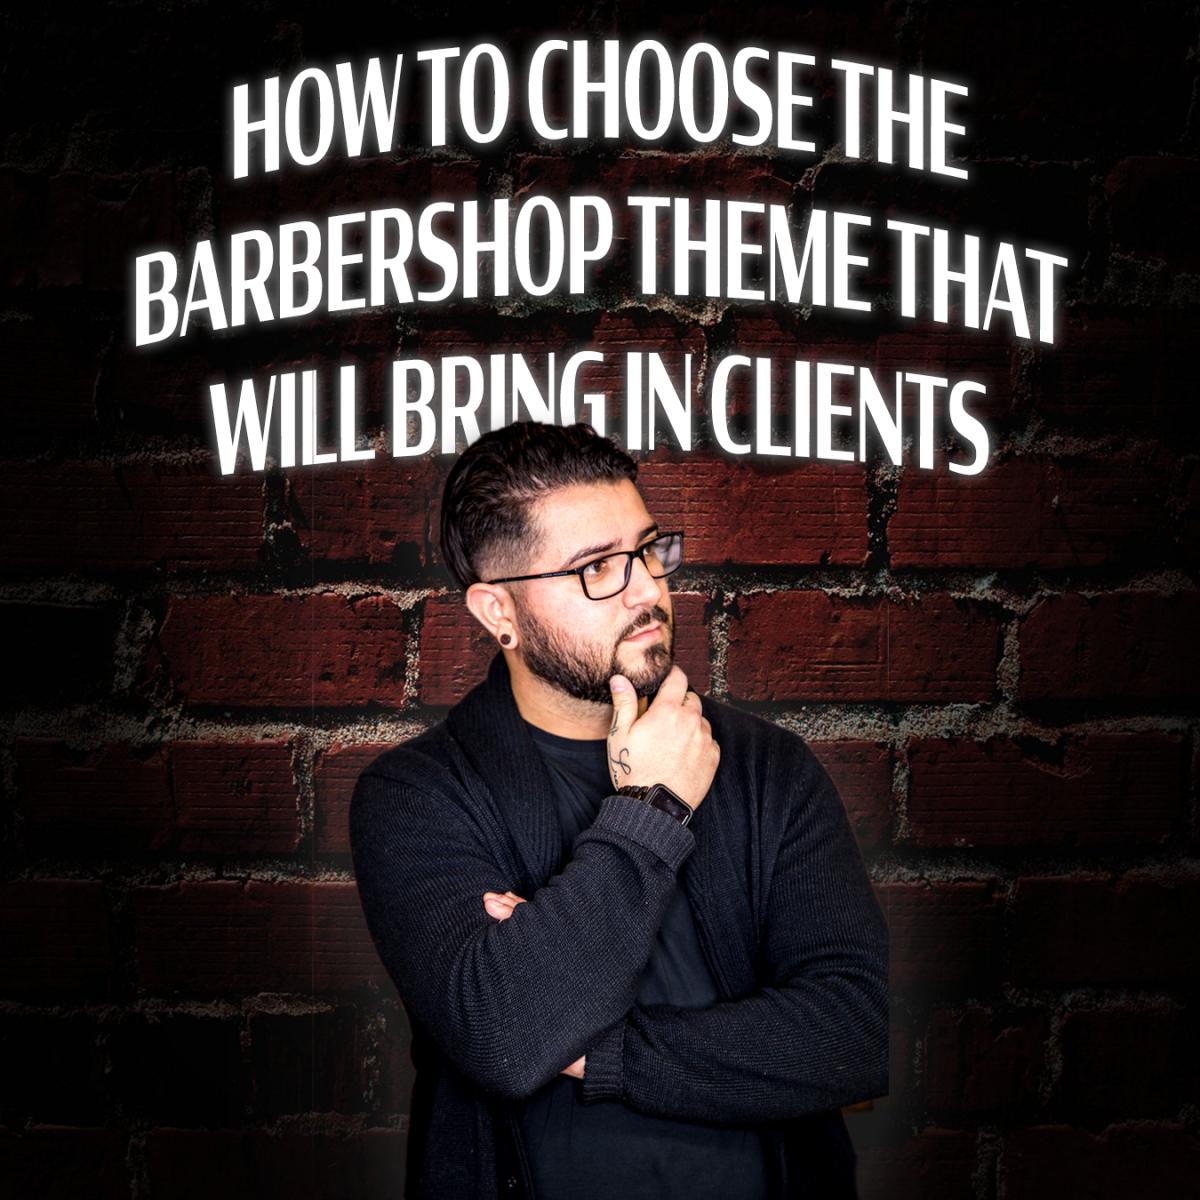 BarbershopTheme